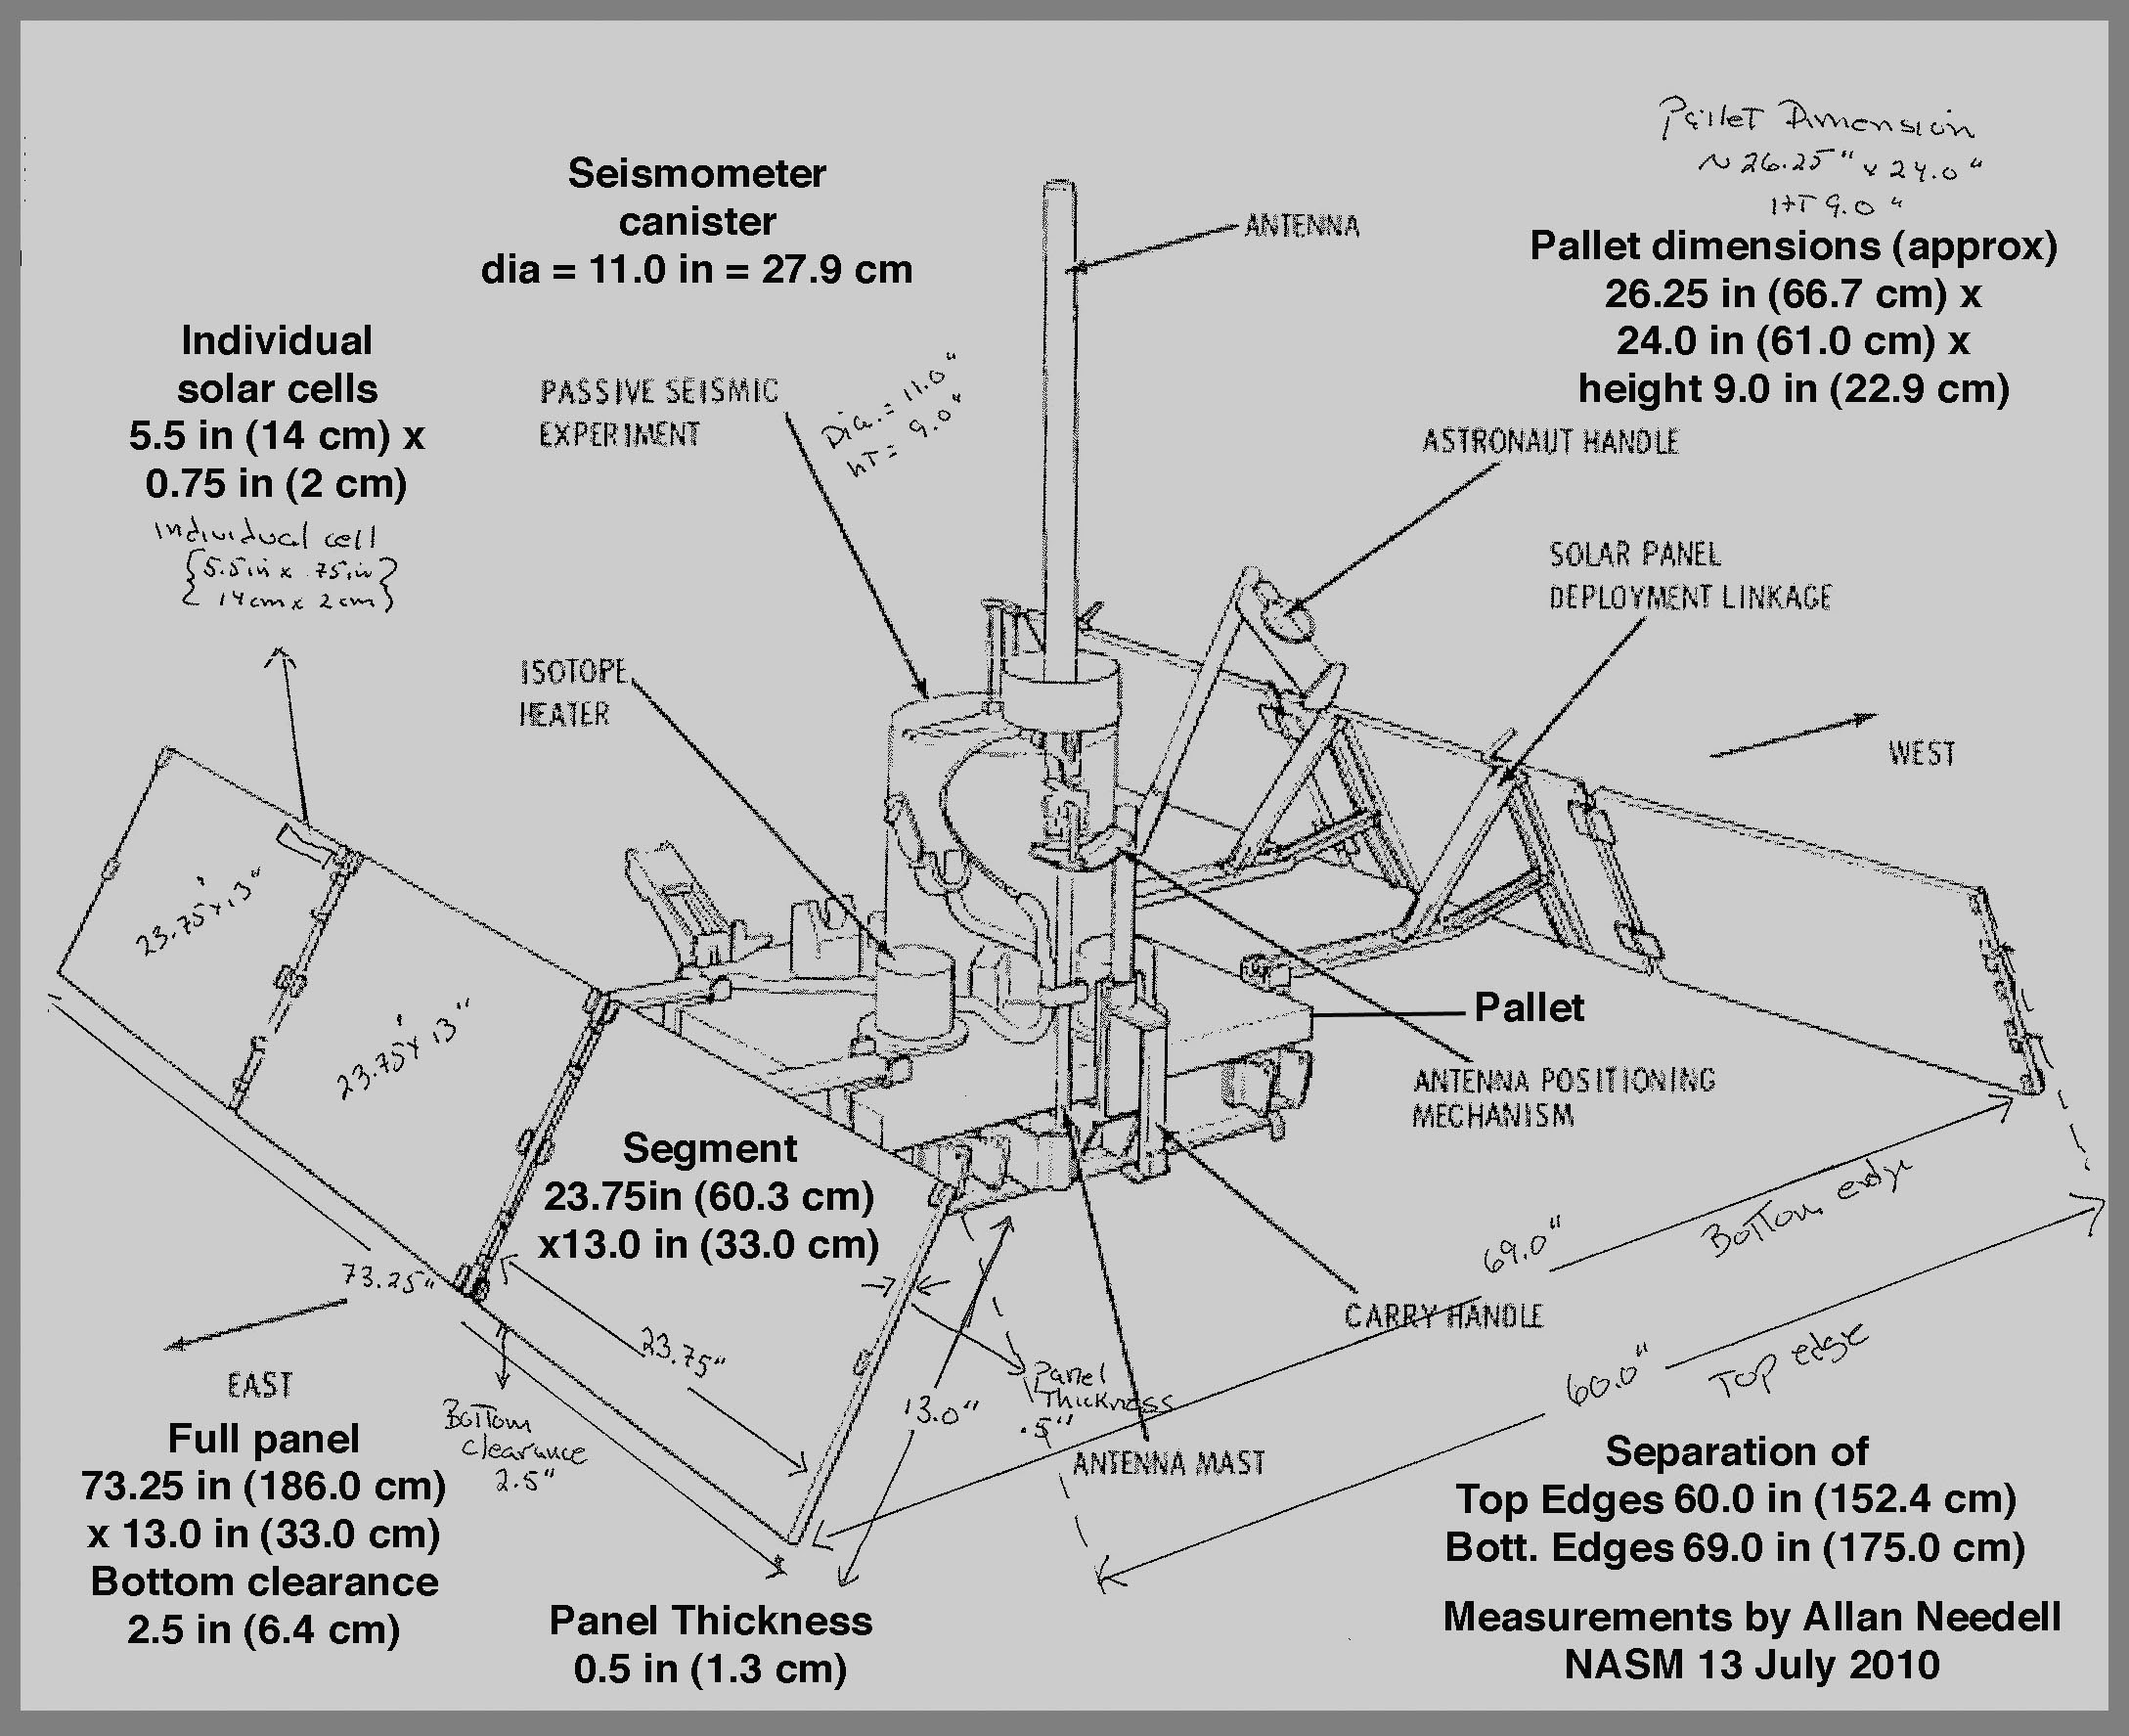 Apollo 11 Seismic Experiment